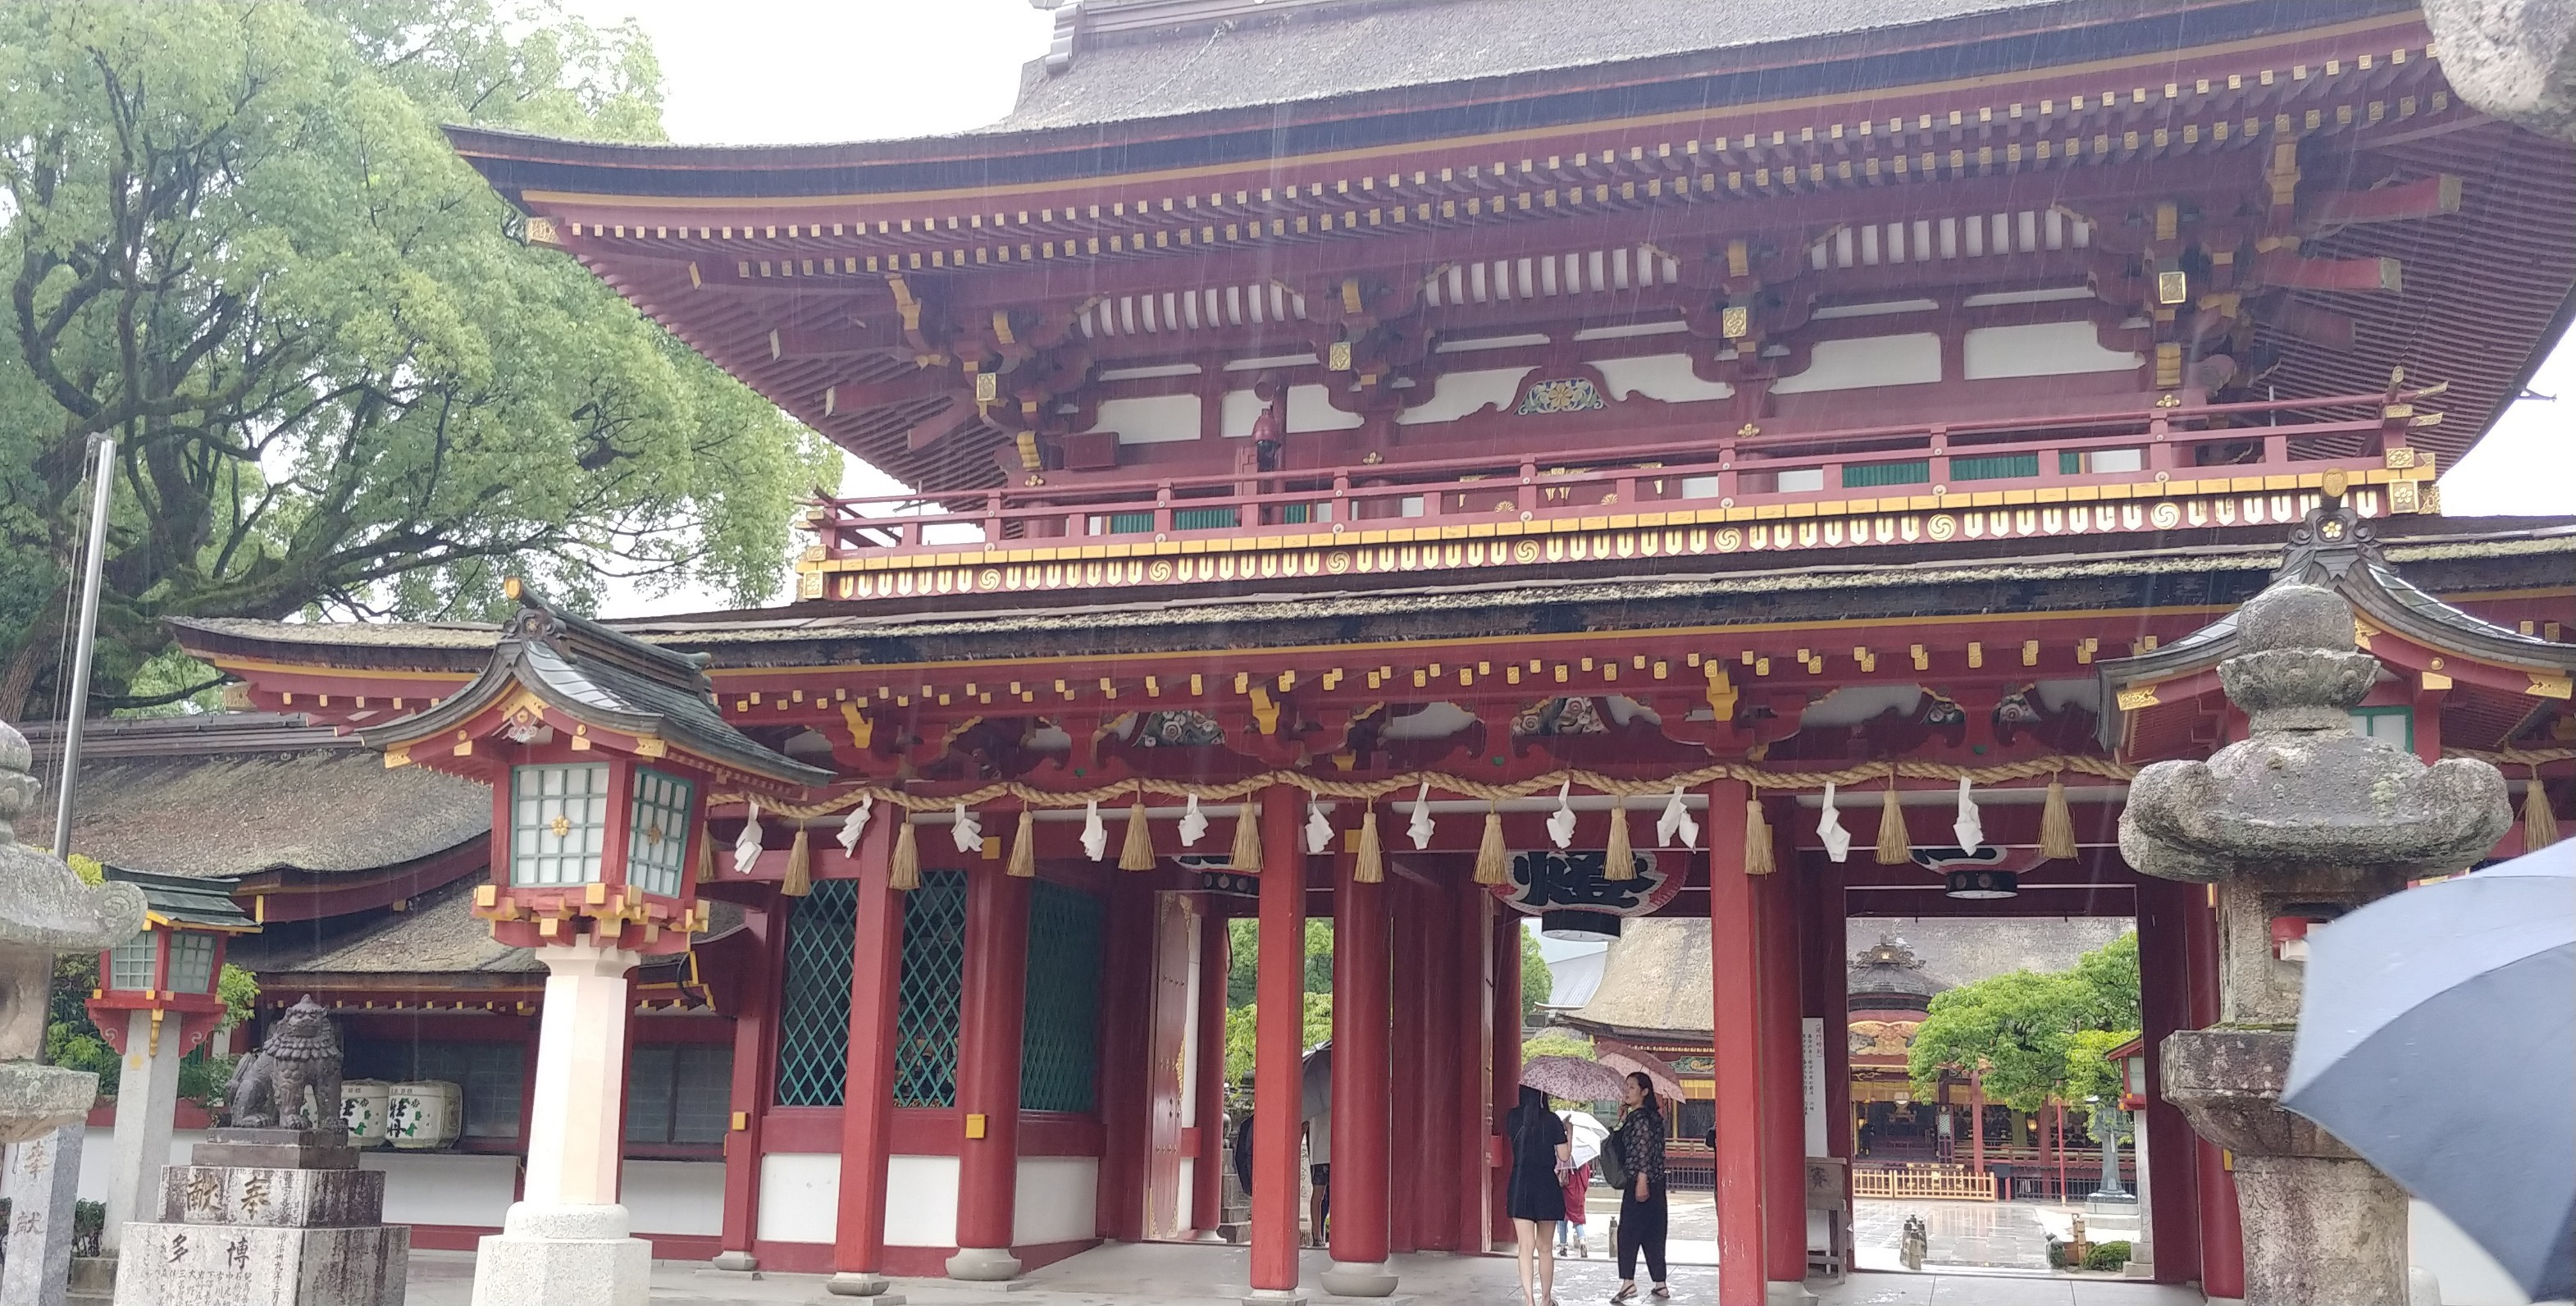 f:id:kishuji-kaisoku:20200216102143j:image